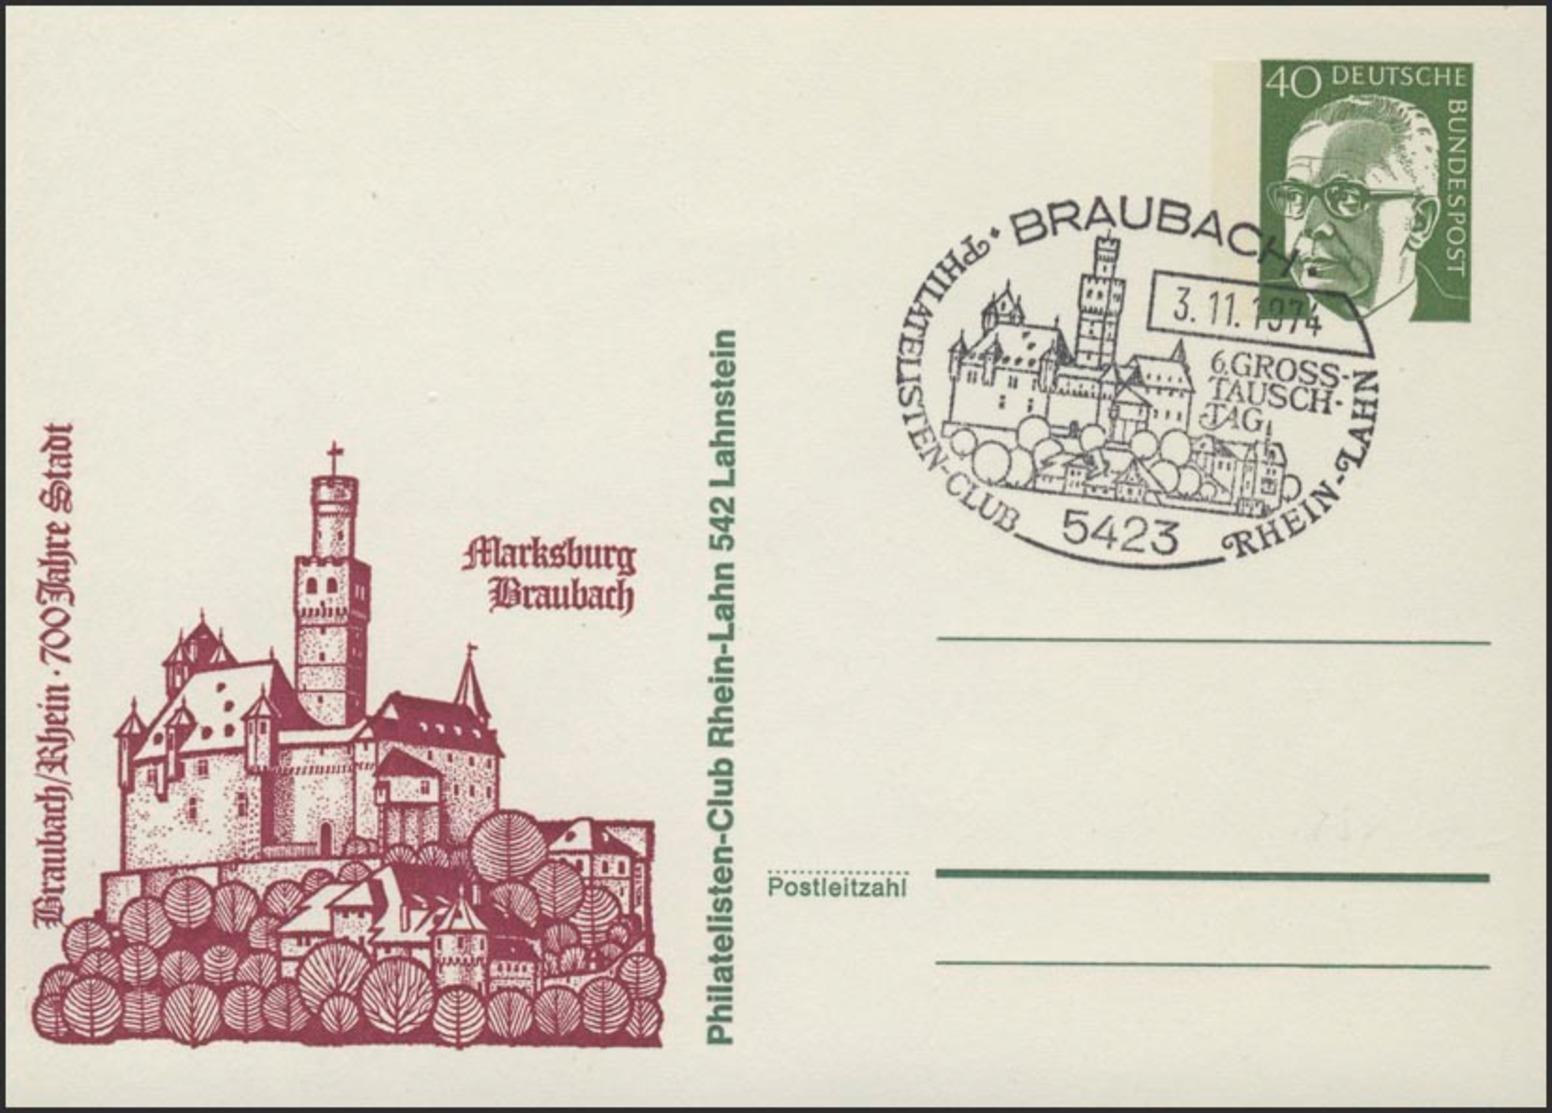 Pk 40 Pf Heinemann/grün Braubach/Rhein Marksburg SSt - [7] República Federal